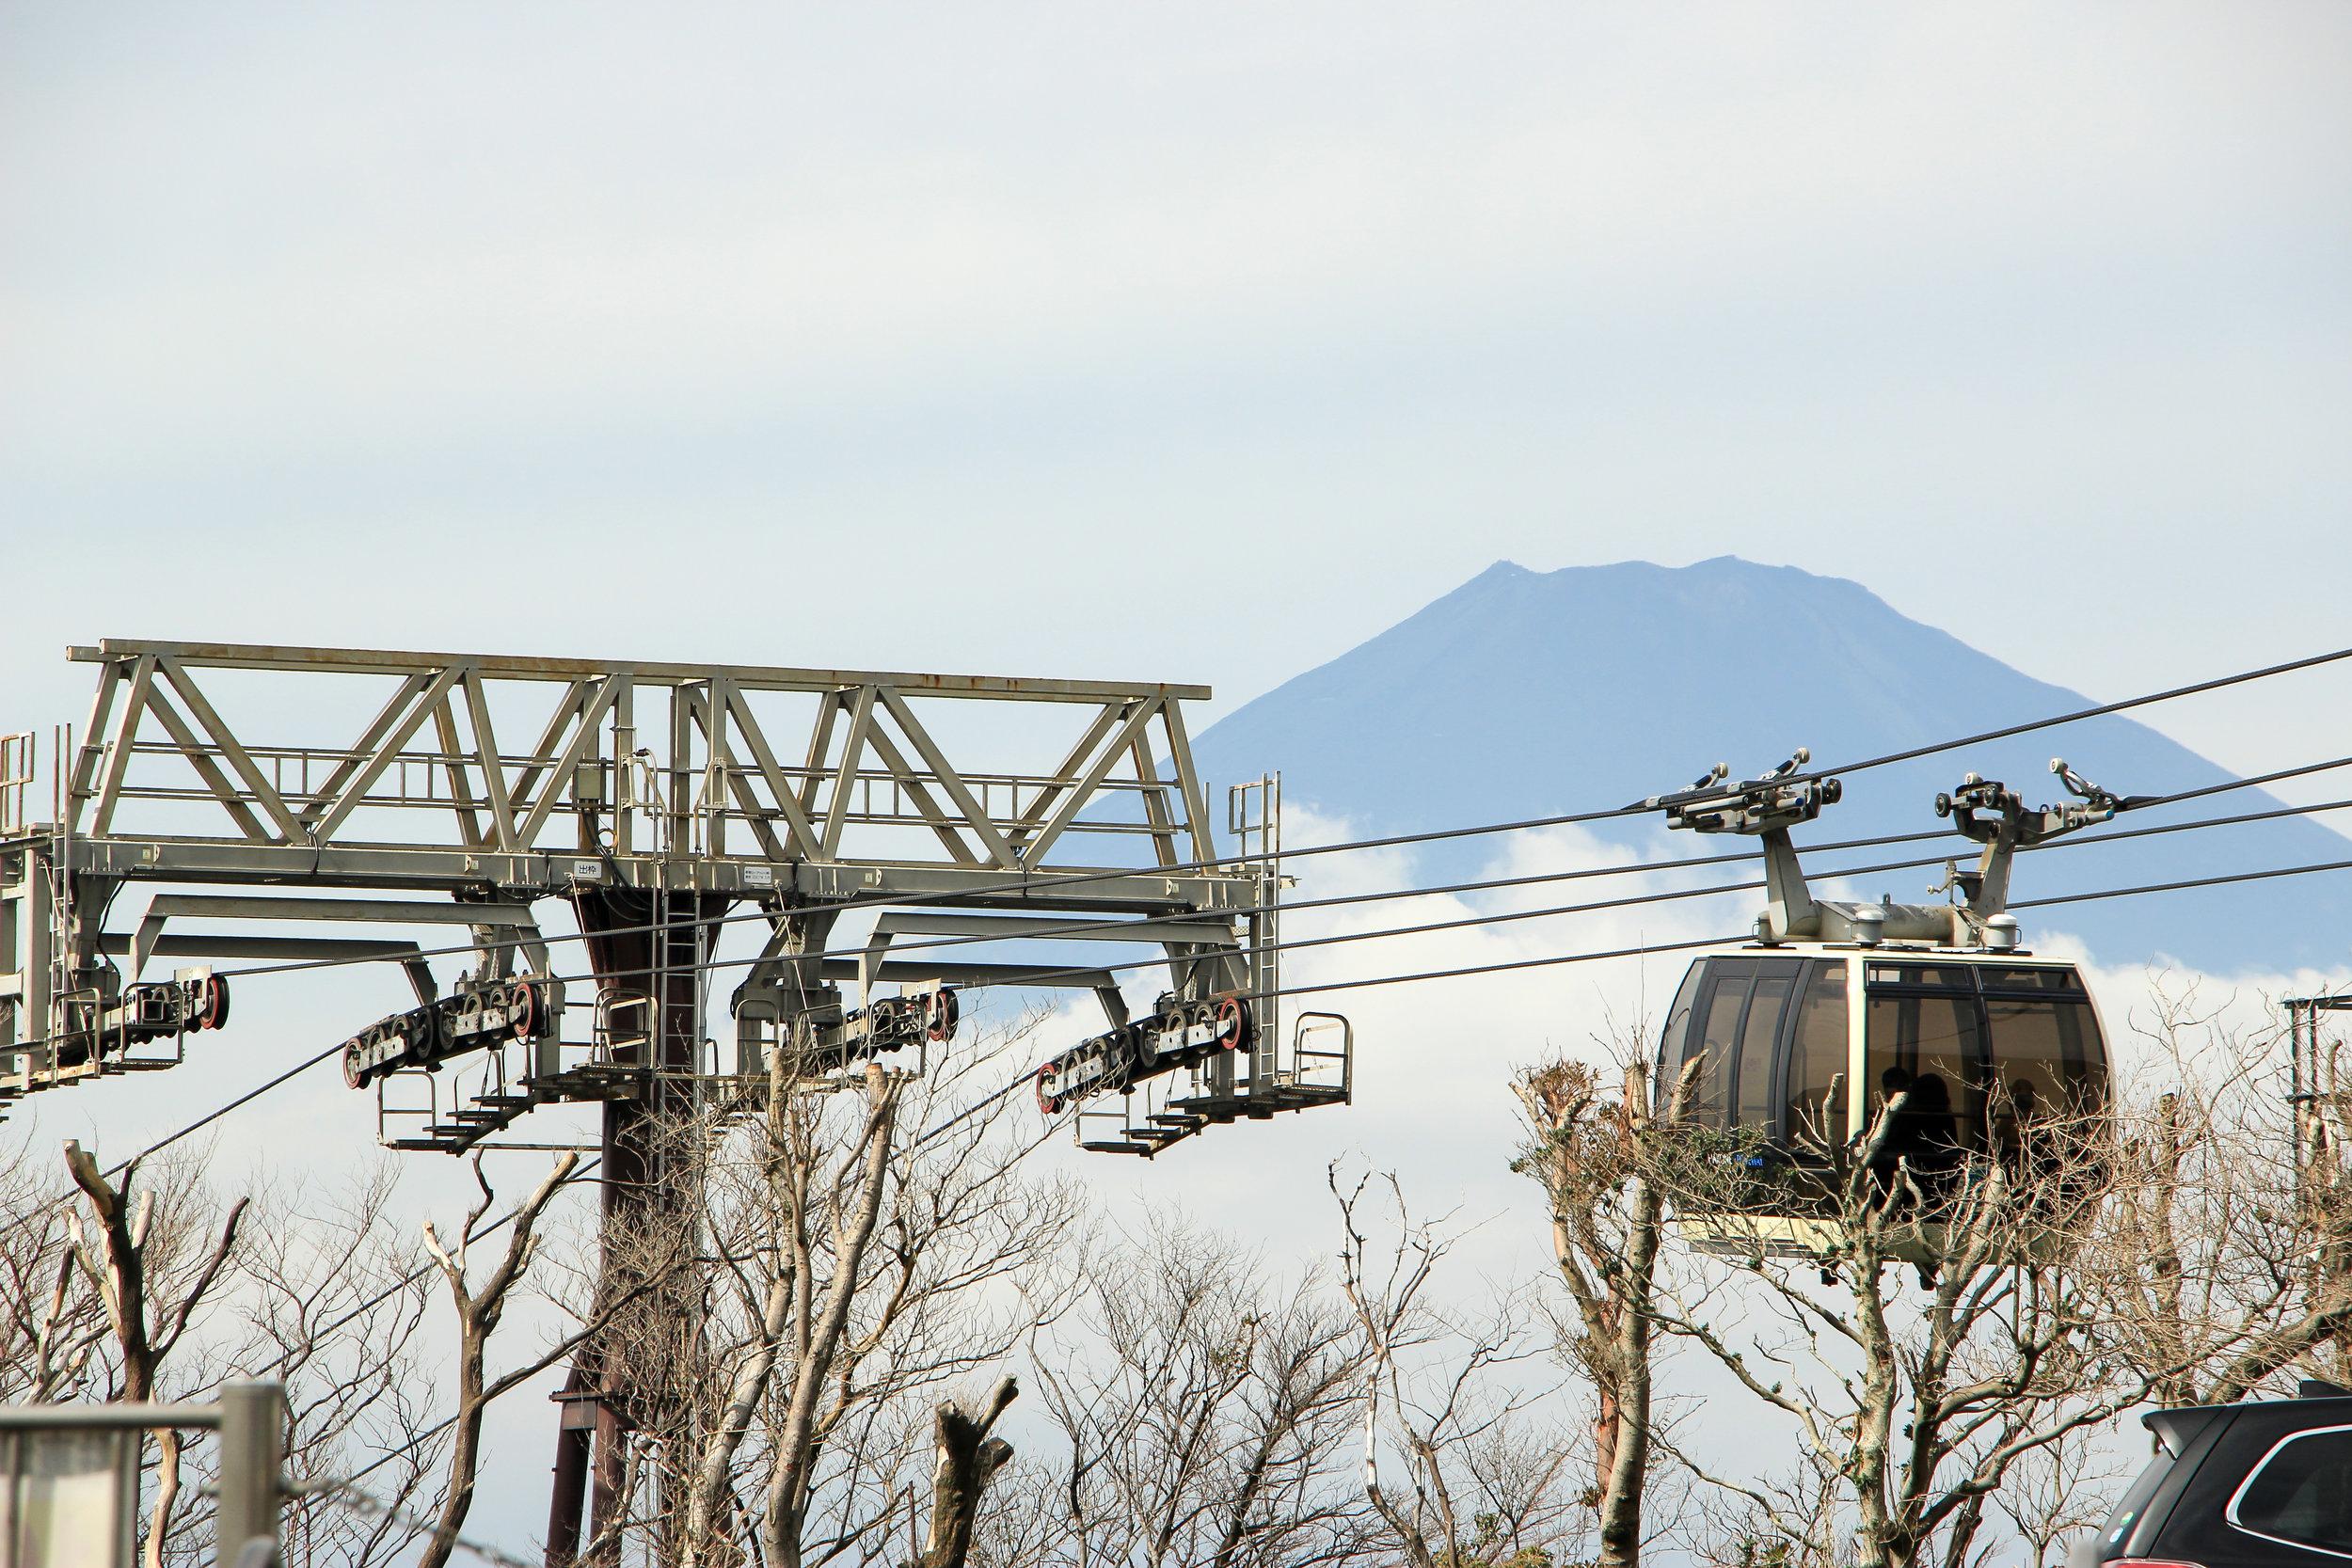 Hakone In A Simple Way Like That | Fuji, Owakudani, Hakone, Volcano, Ropeway | Fuji-Hakone-Izu National Park, Japan, Asia | DoLessGetMoreDone.com |